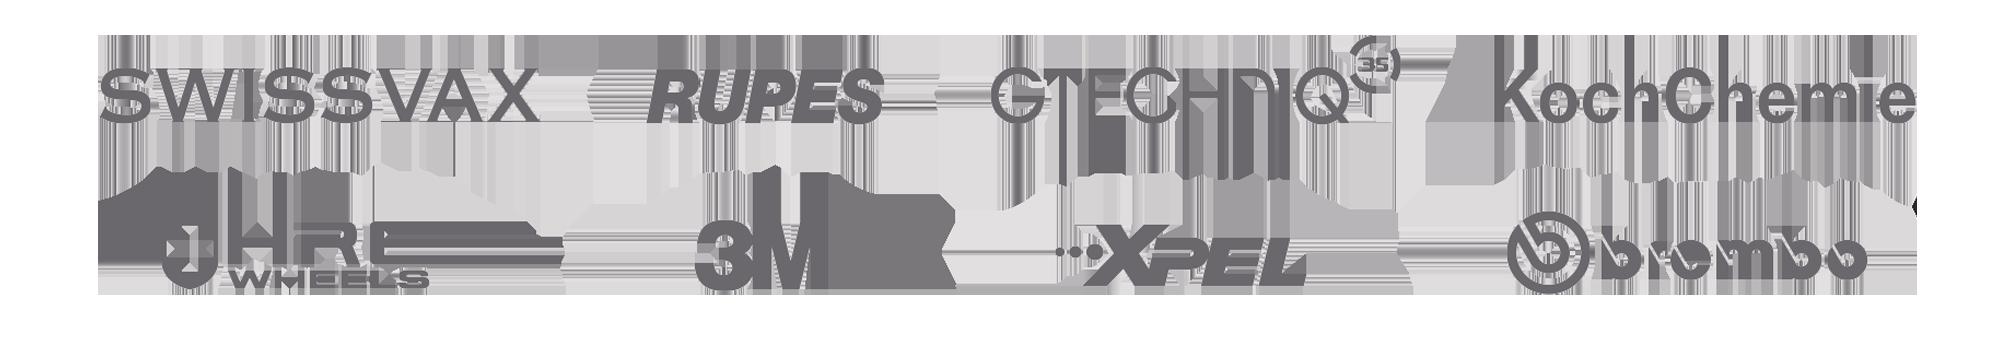 Swissvax, Rupes, Gtechniq, KochChemie, HRE, 3M, Xpel and Brembo